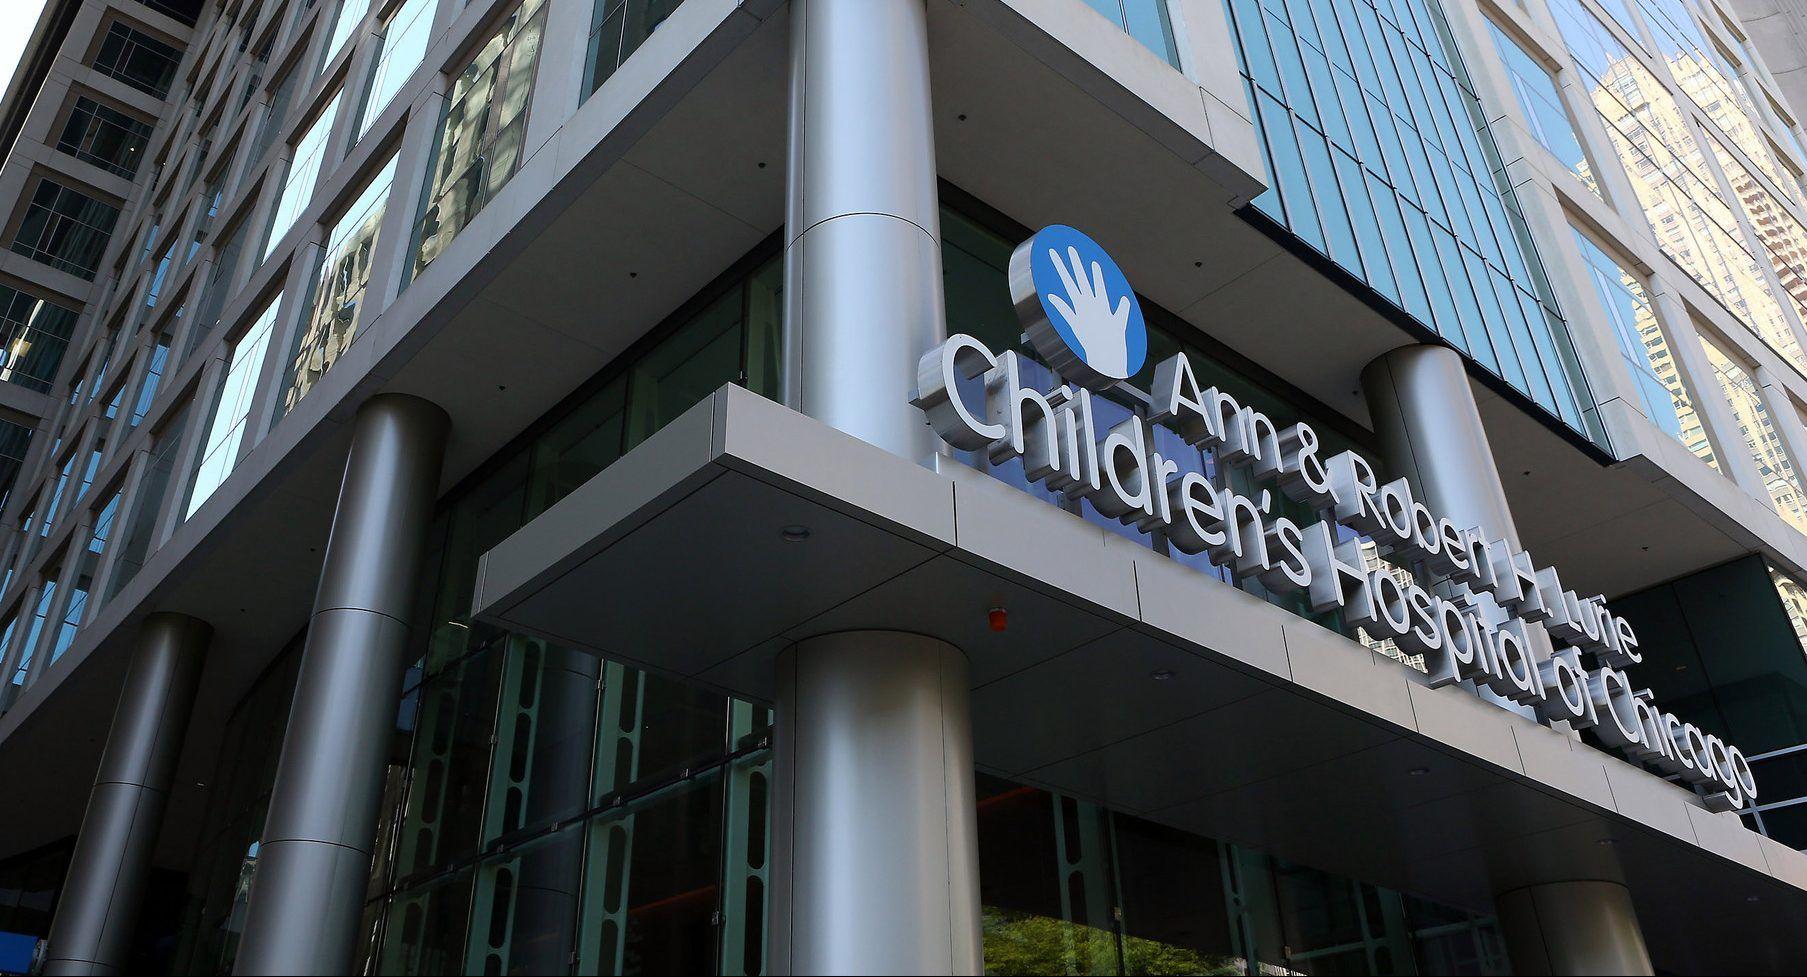 hospi lurie childrens hospital - HD1807×977